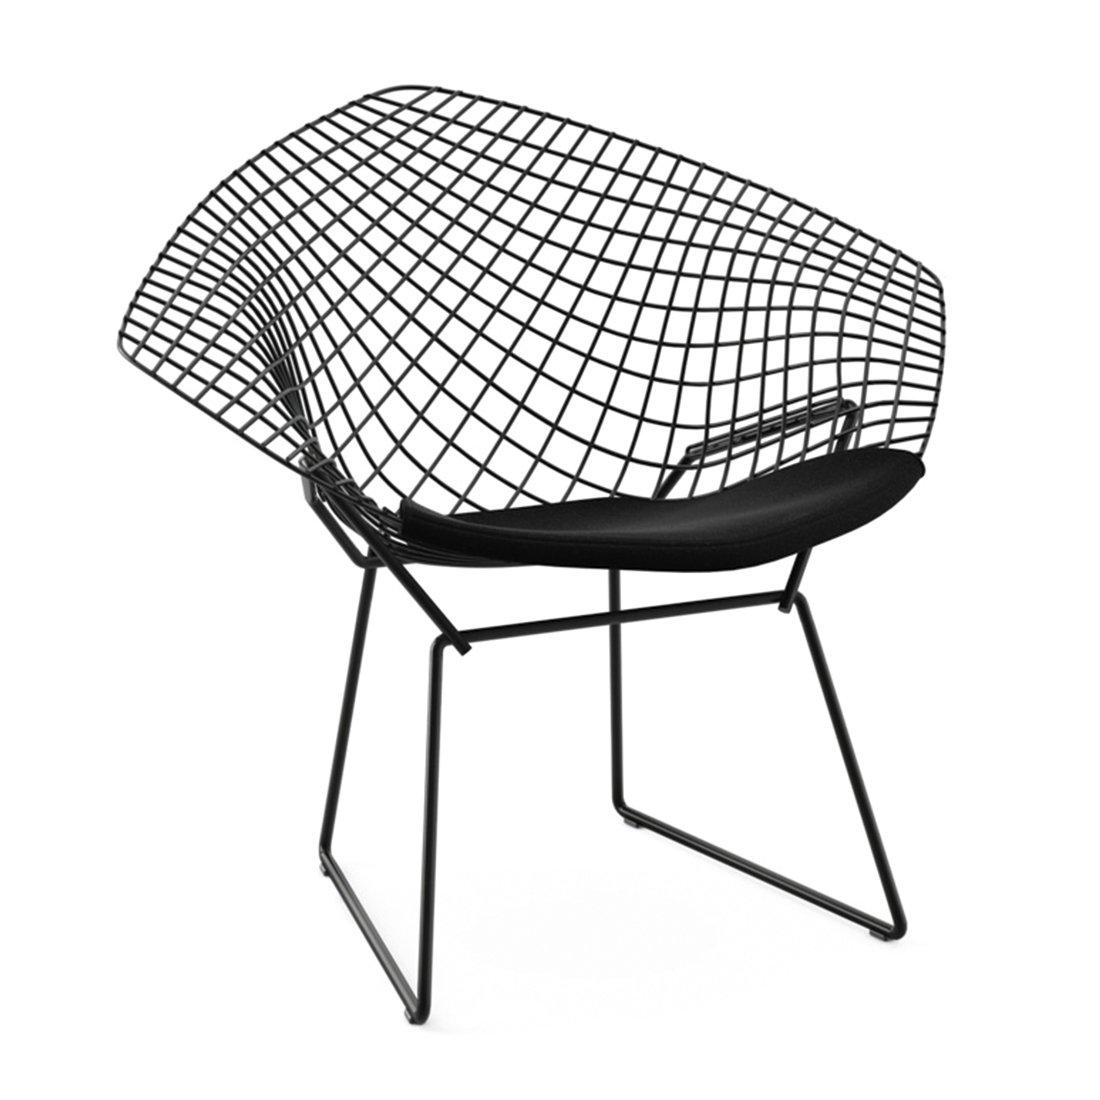 Knoll Diamond Lounge Chair Zwart - Ultrasuede Black Onyx